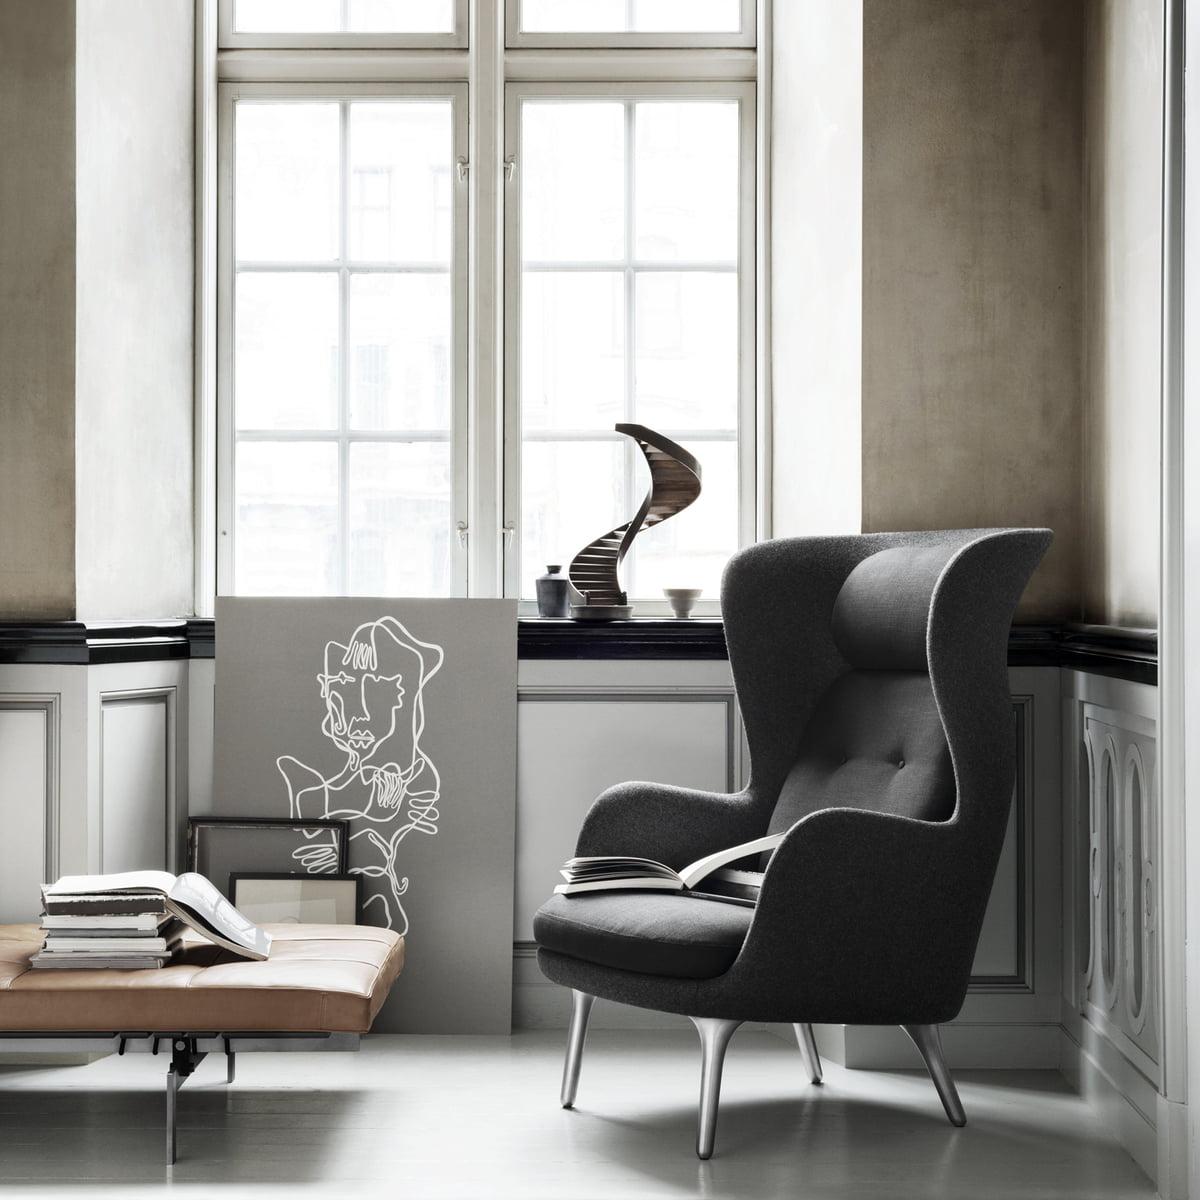 fritz hansen ro sessel im wohndesign shop. Black Bedroom Furniture Sets. Home Design Ideas